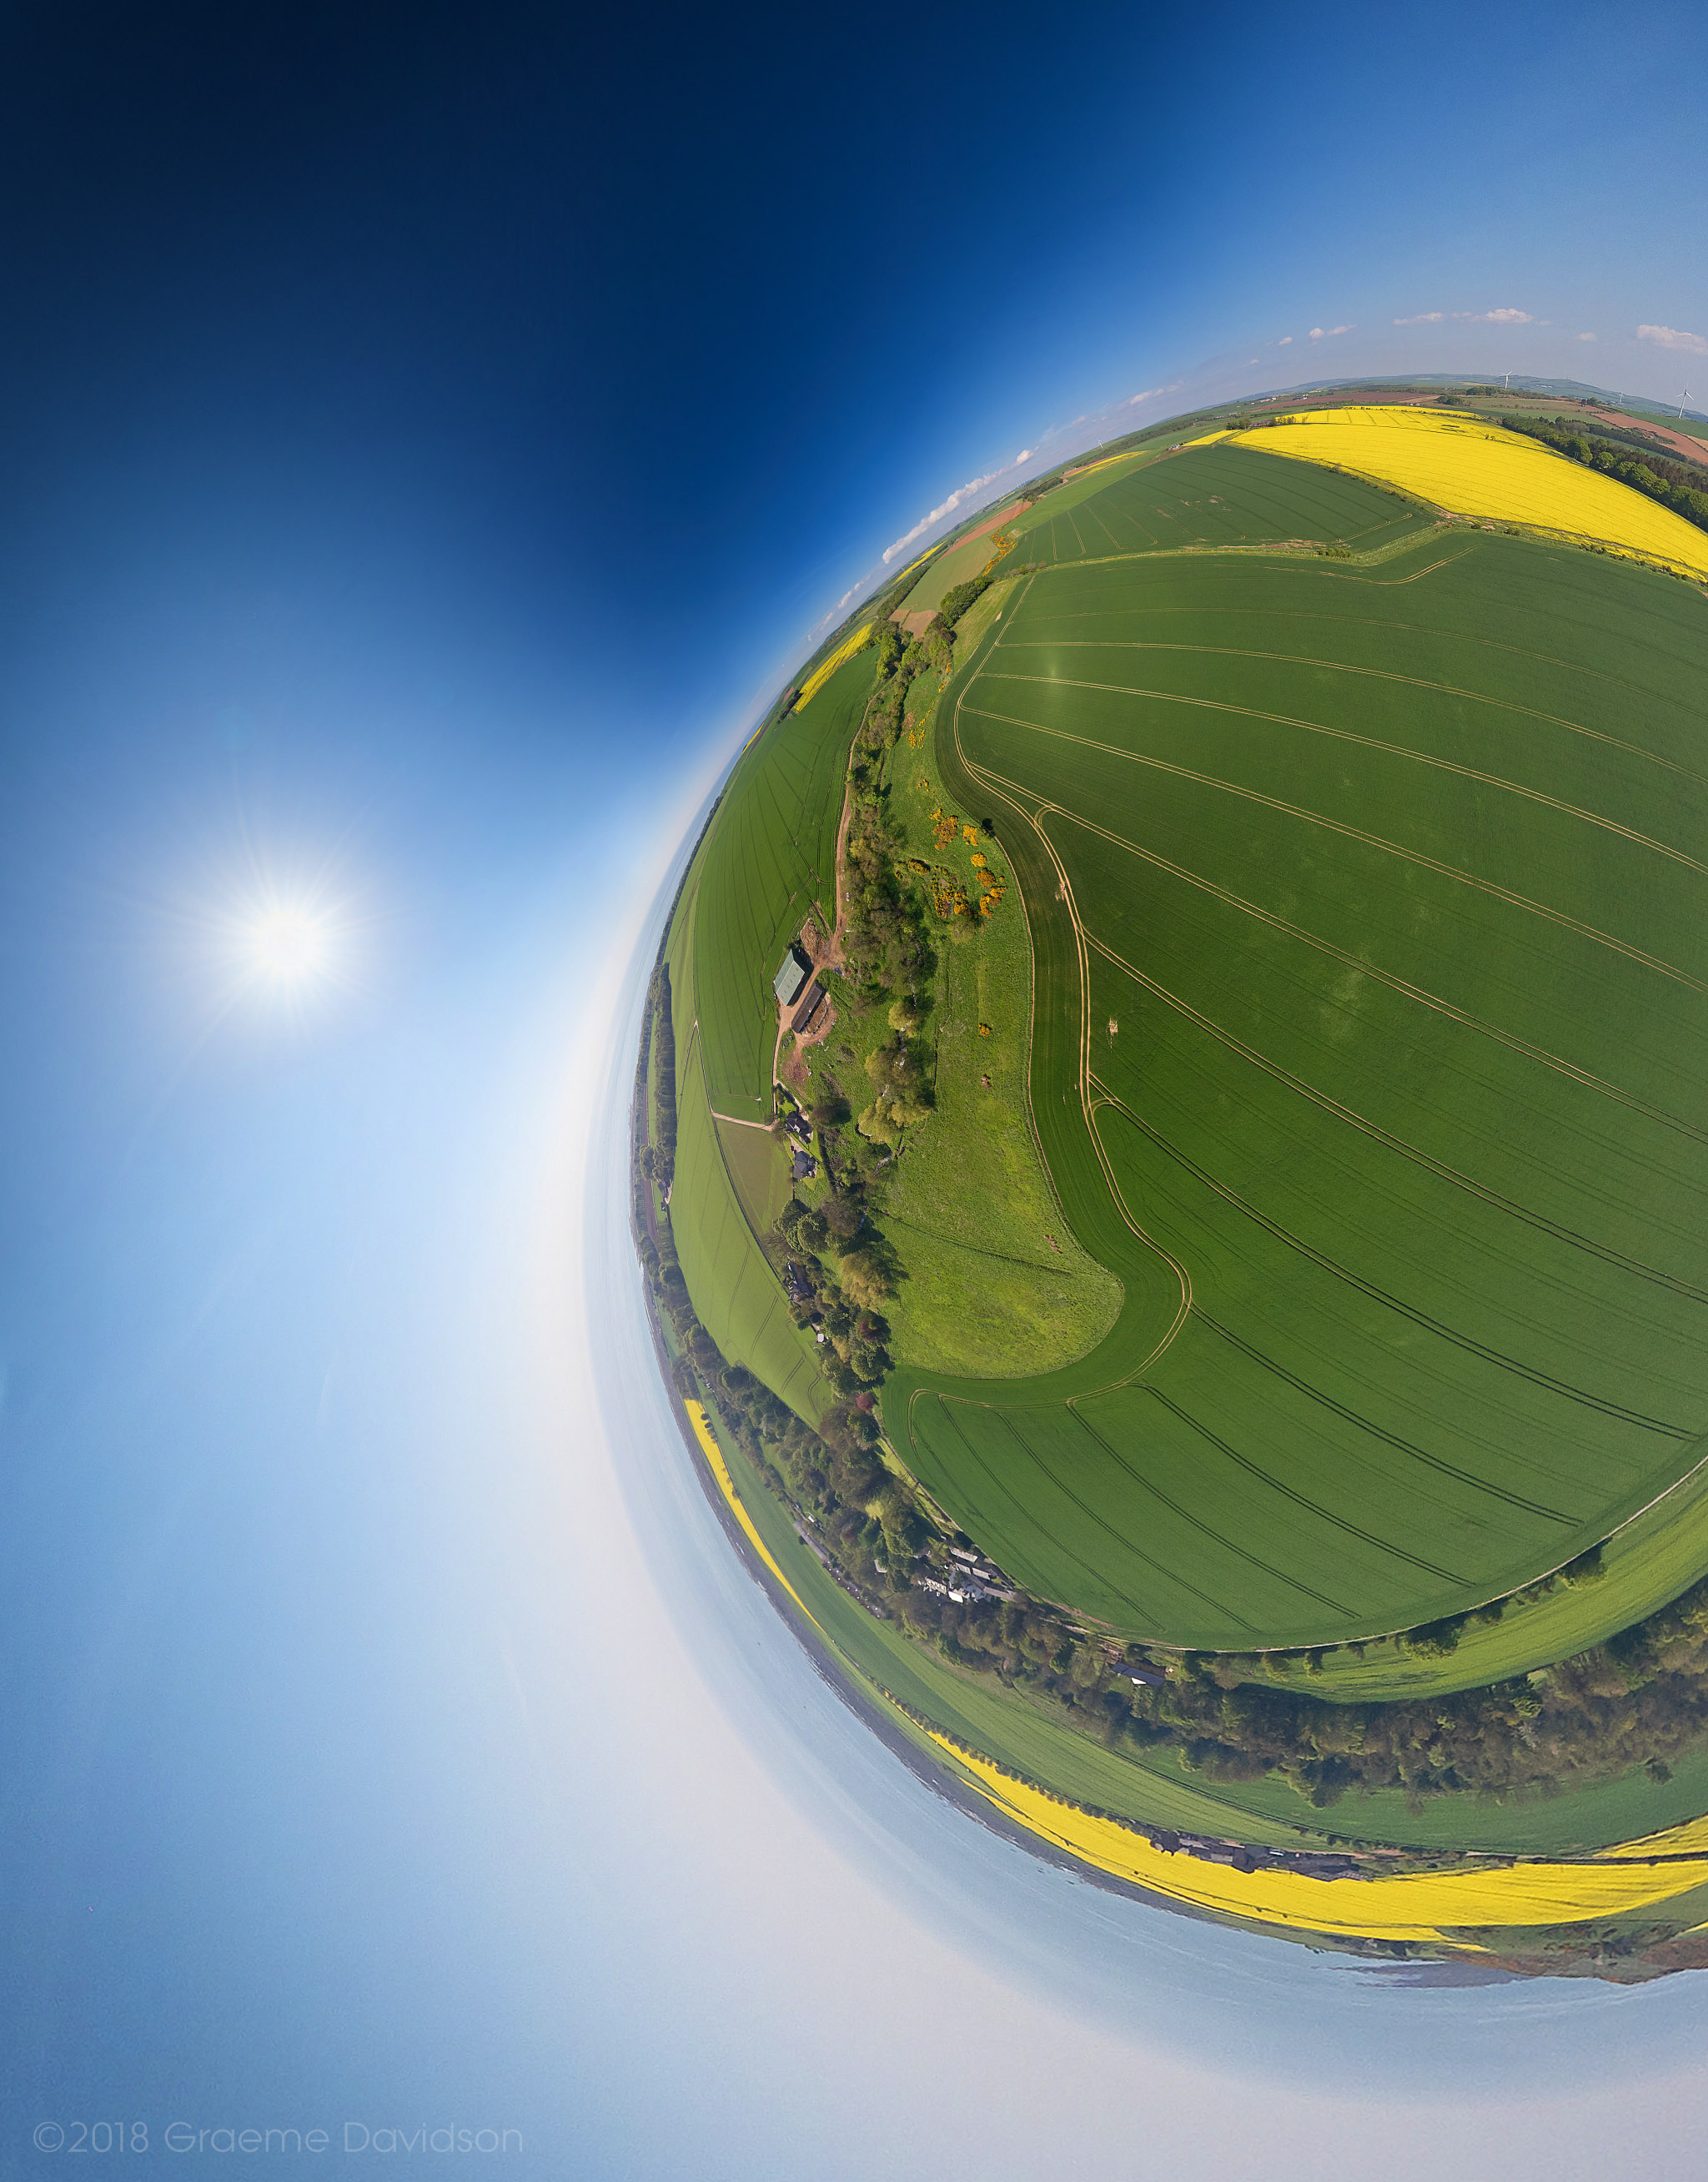 Upper Birnie - Little planet